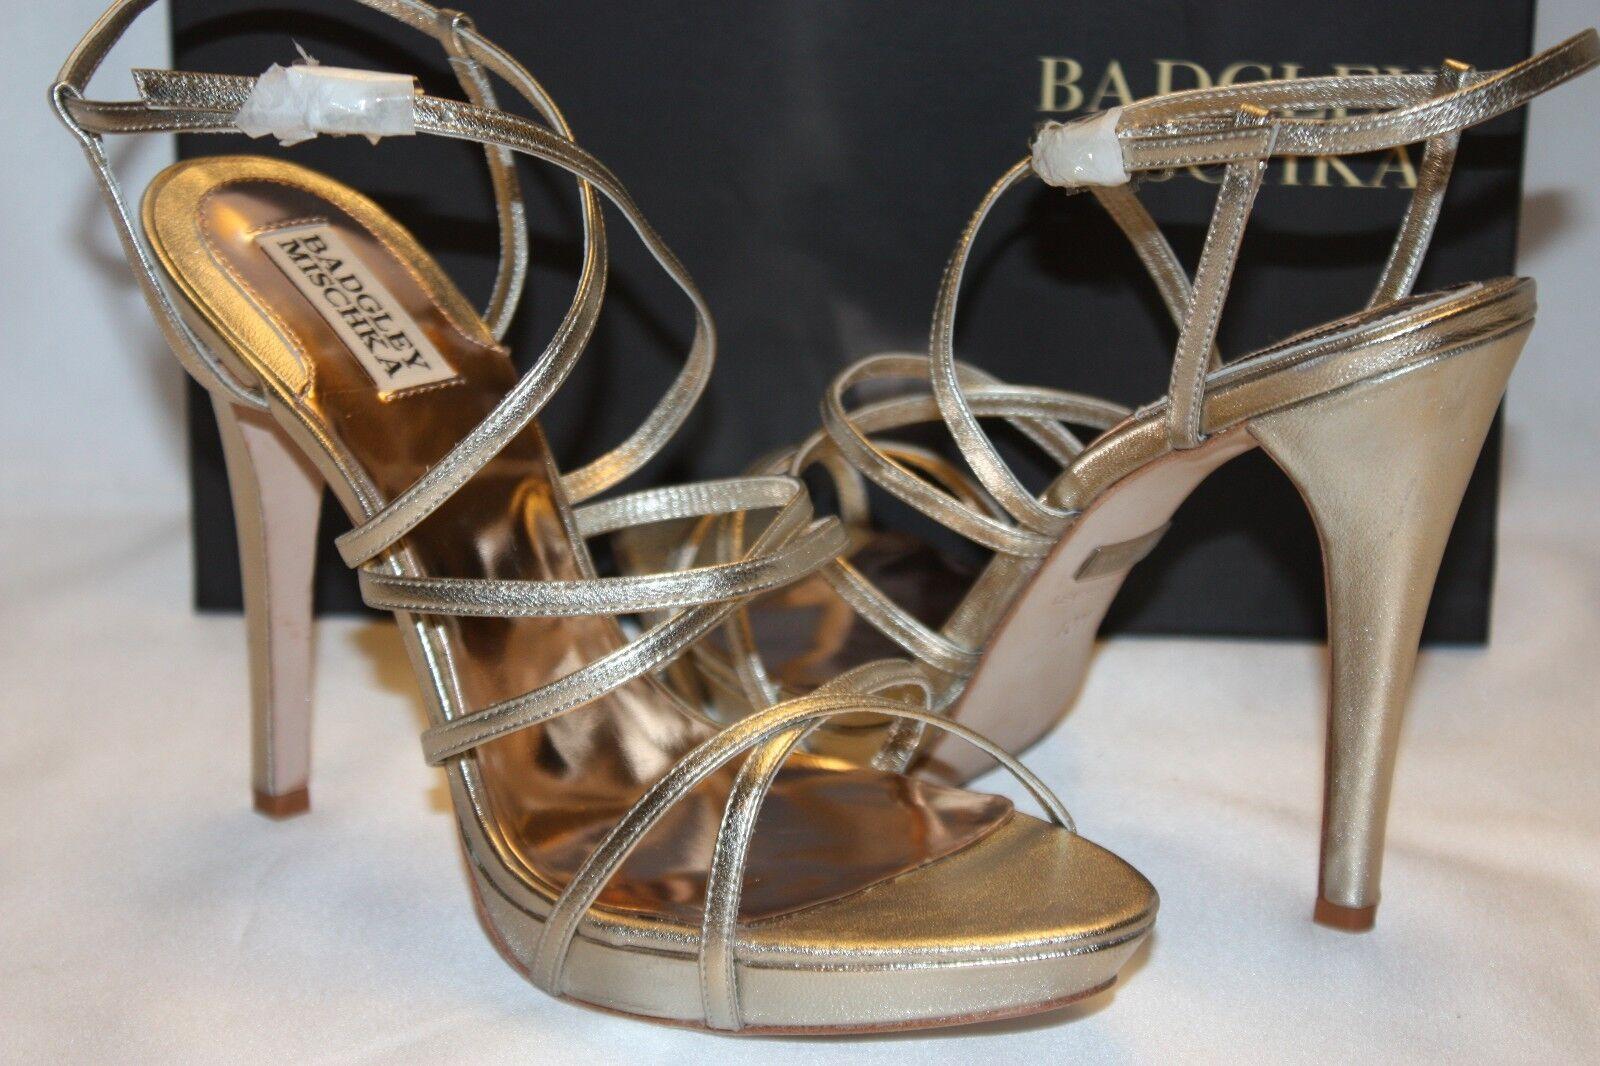 NEU NIB BADGLEY MISCHKA Platino Leder IDOL Strappy Bridal Wedding Heel 10 175